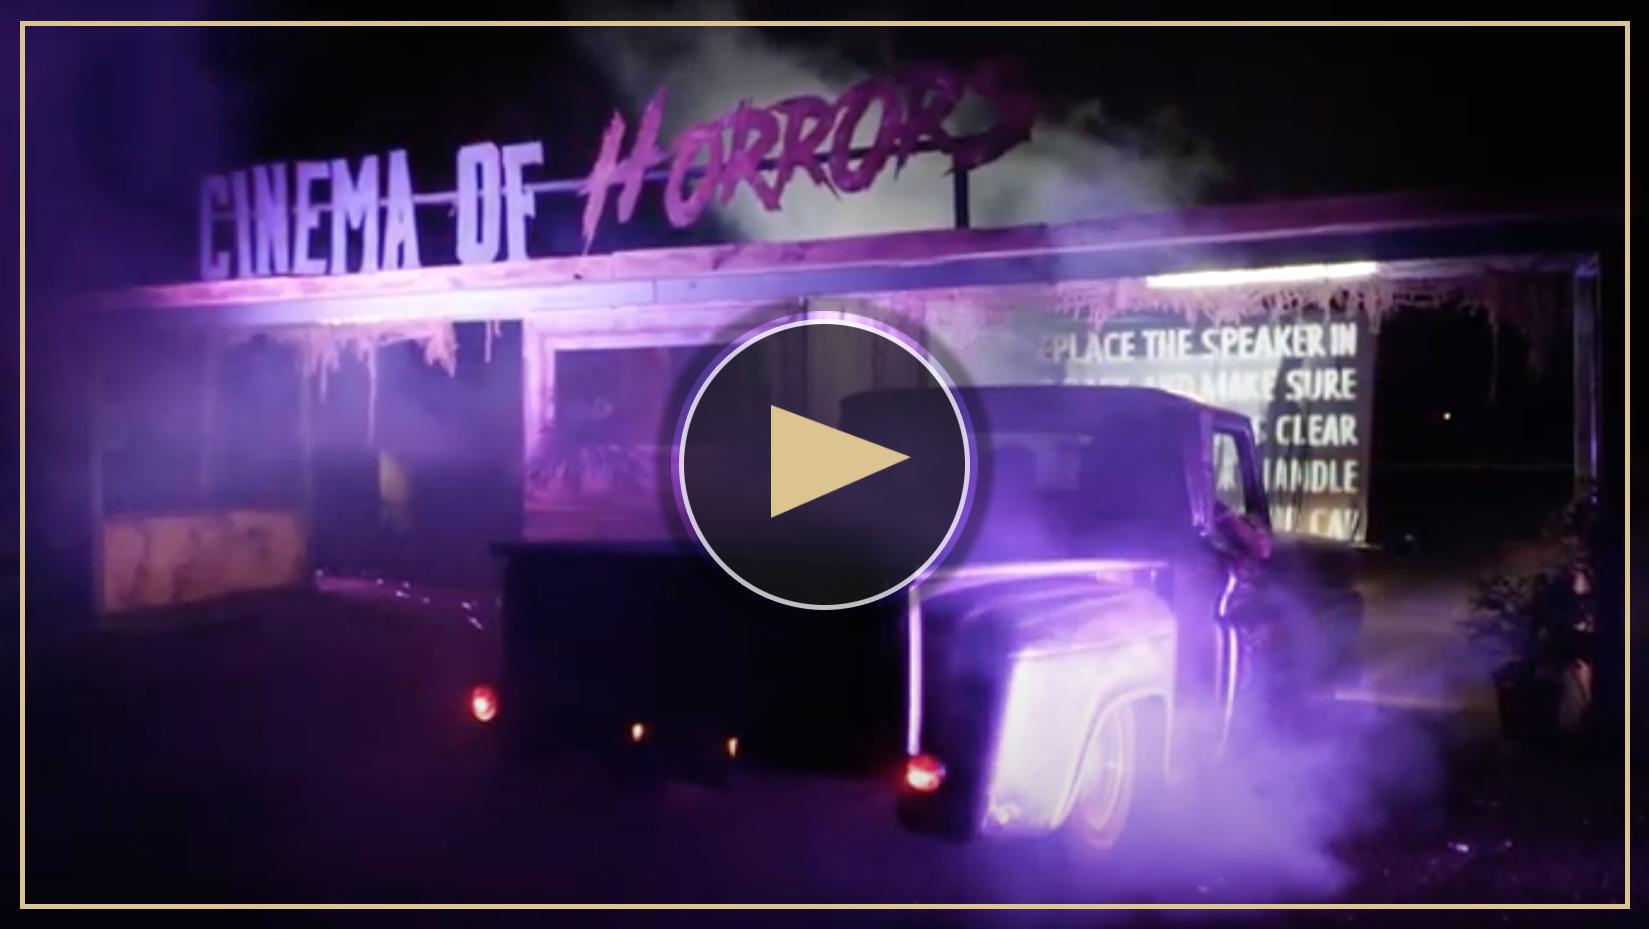 Cinema Of horros